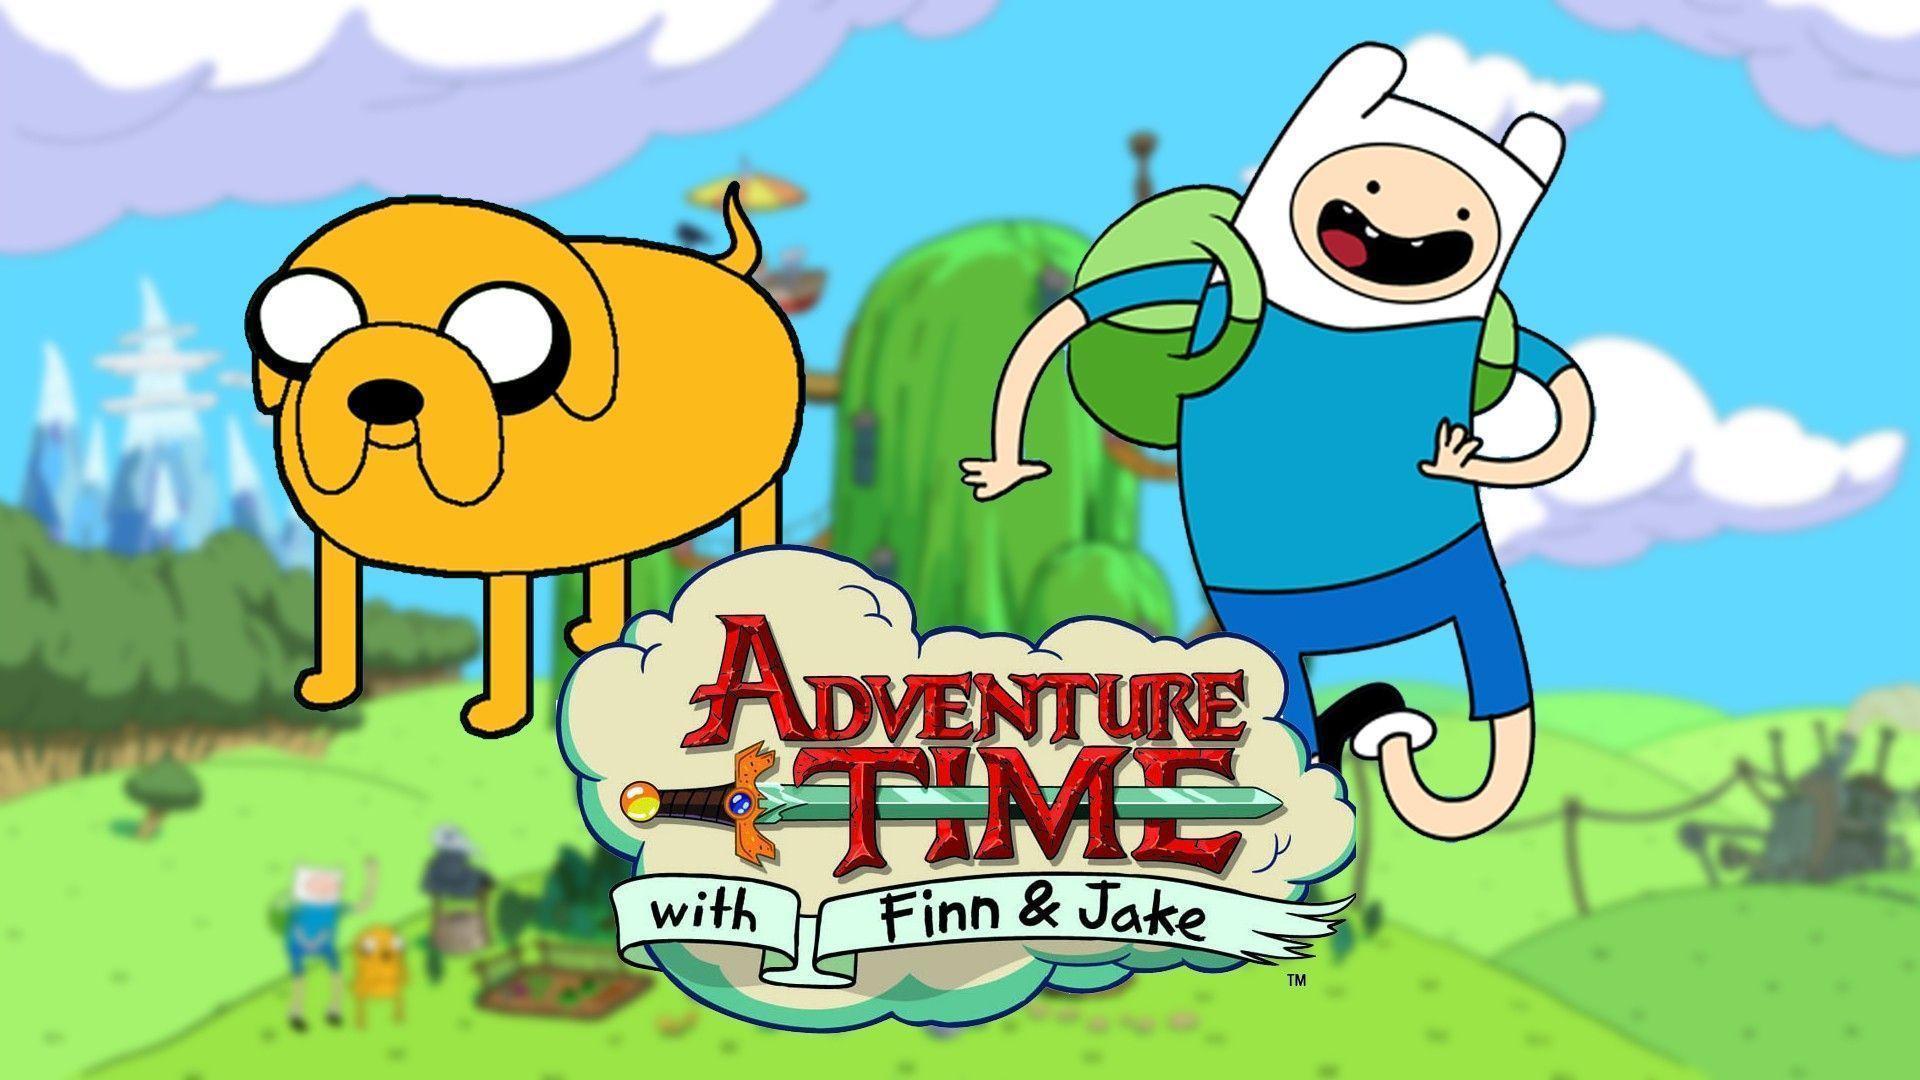 Adventure Time Wallpaper HD 1080p 1119